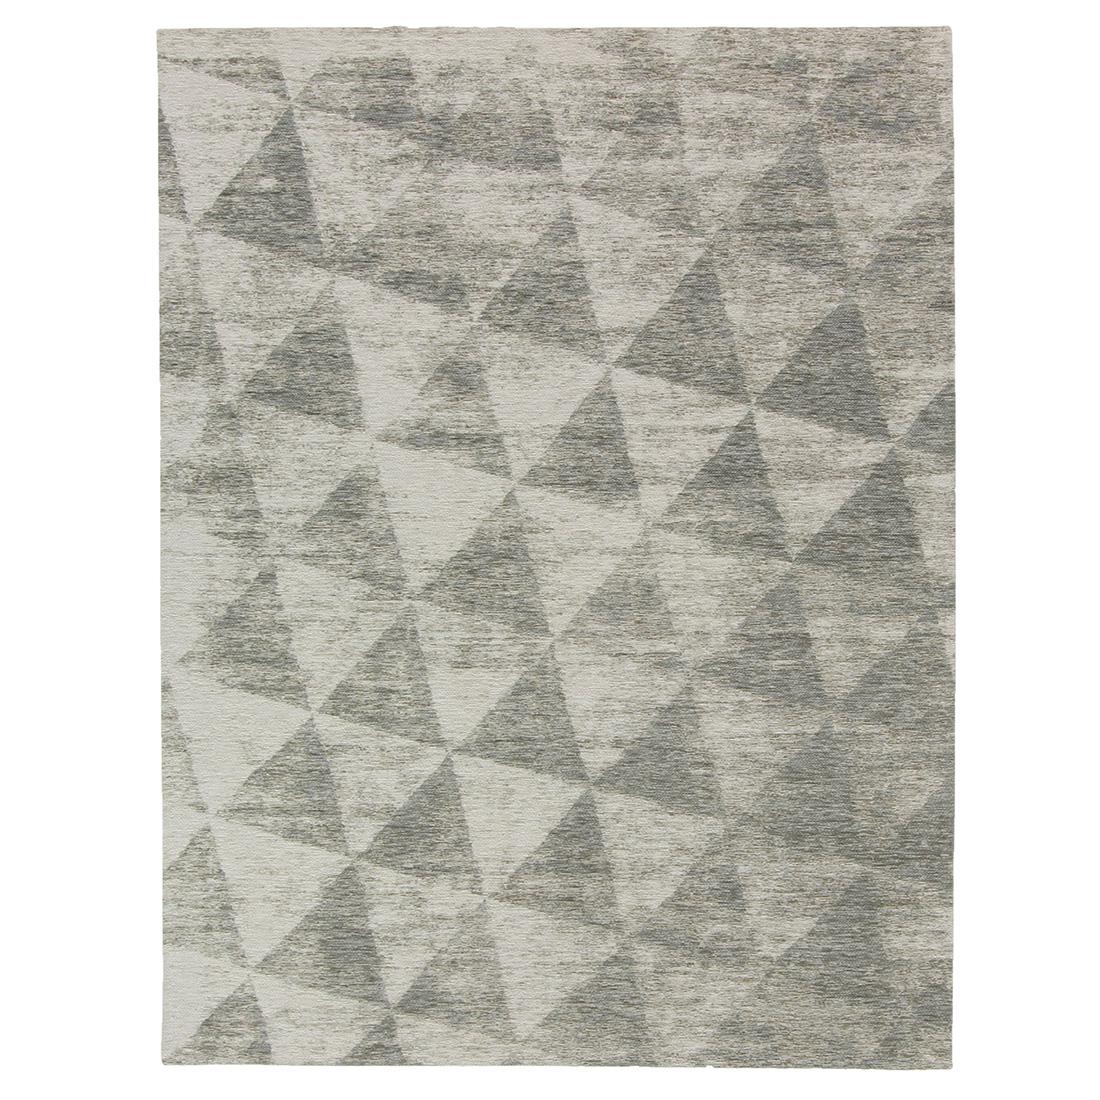 Vloerkleed Brinker Geometrics Coates Grey | 240 x 340 cm